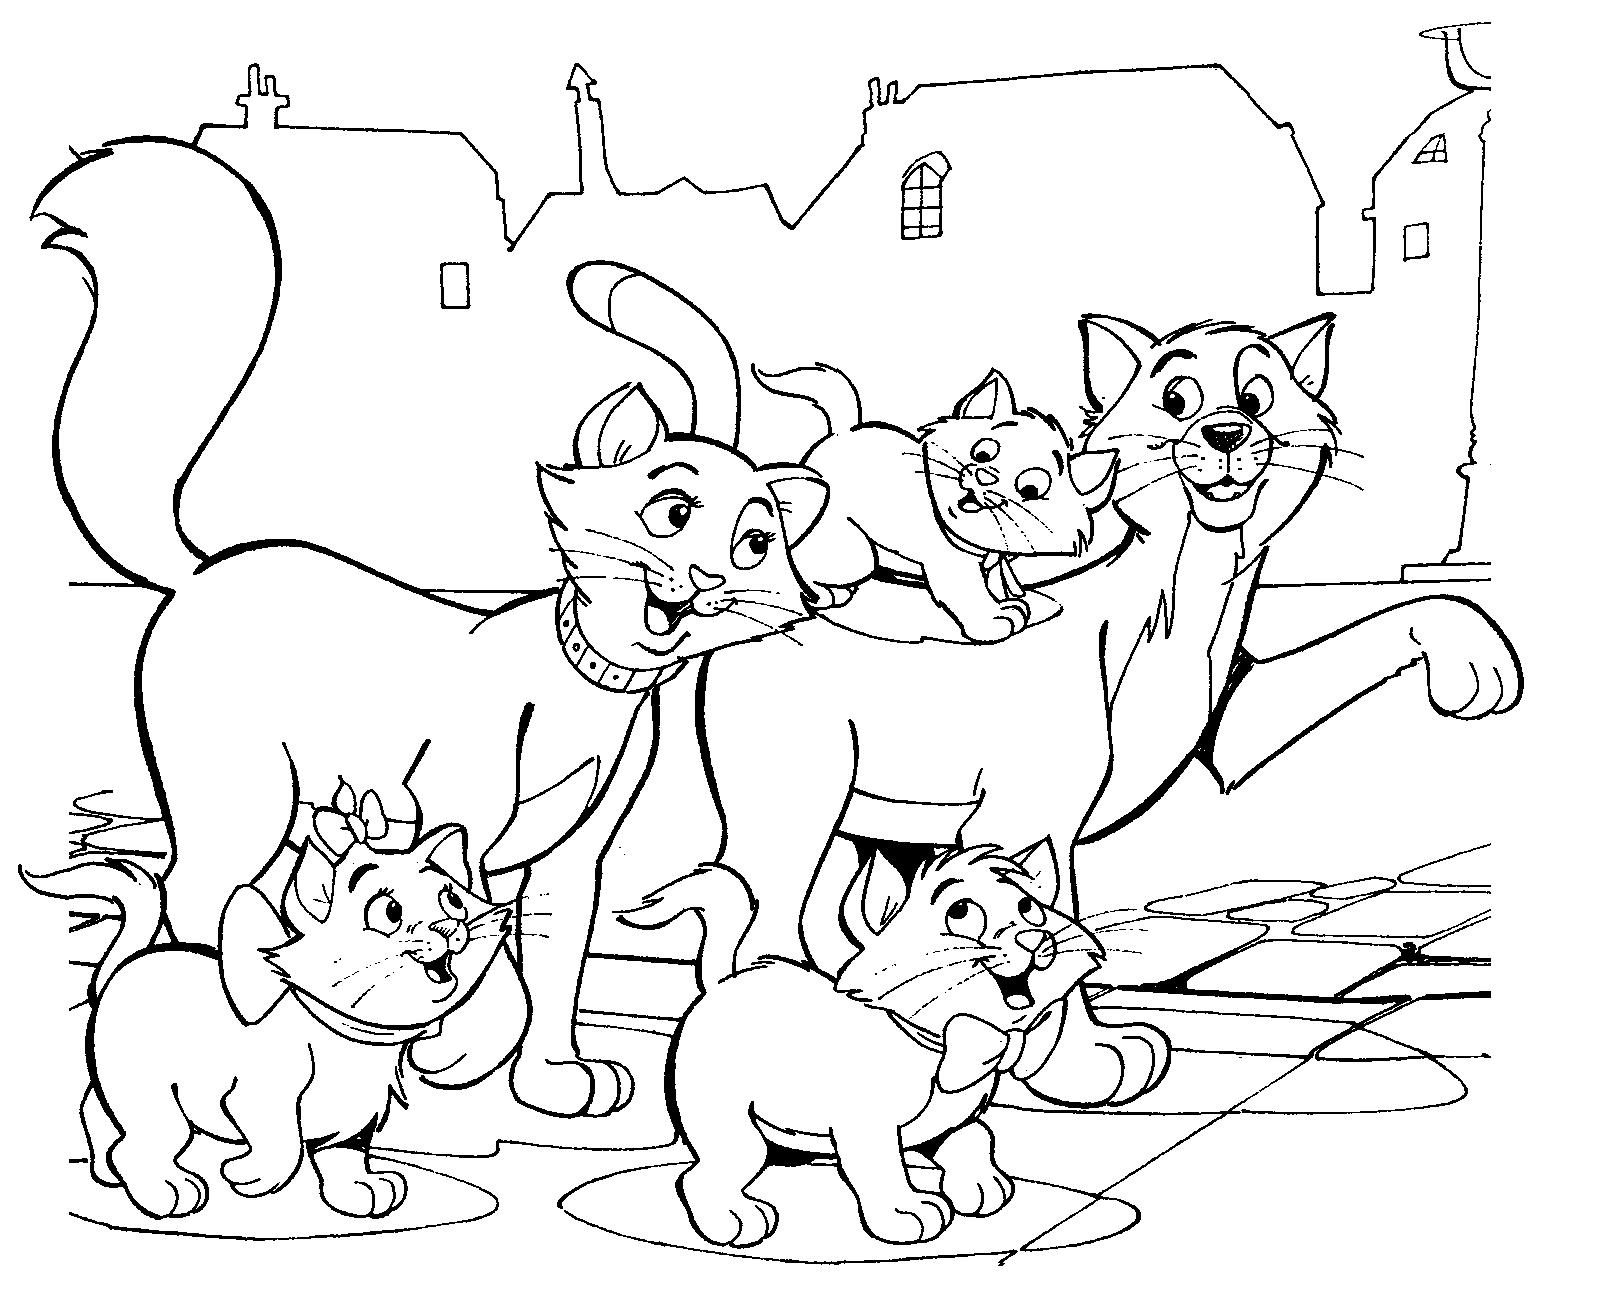 Aristokatskleurplaat Png 1600 1300 Cartoon Coloring Pages Disney Coloring Pages Coloring Pages